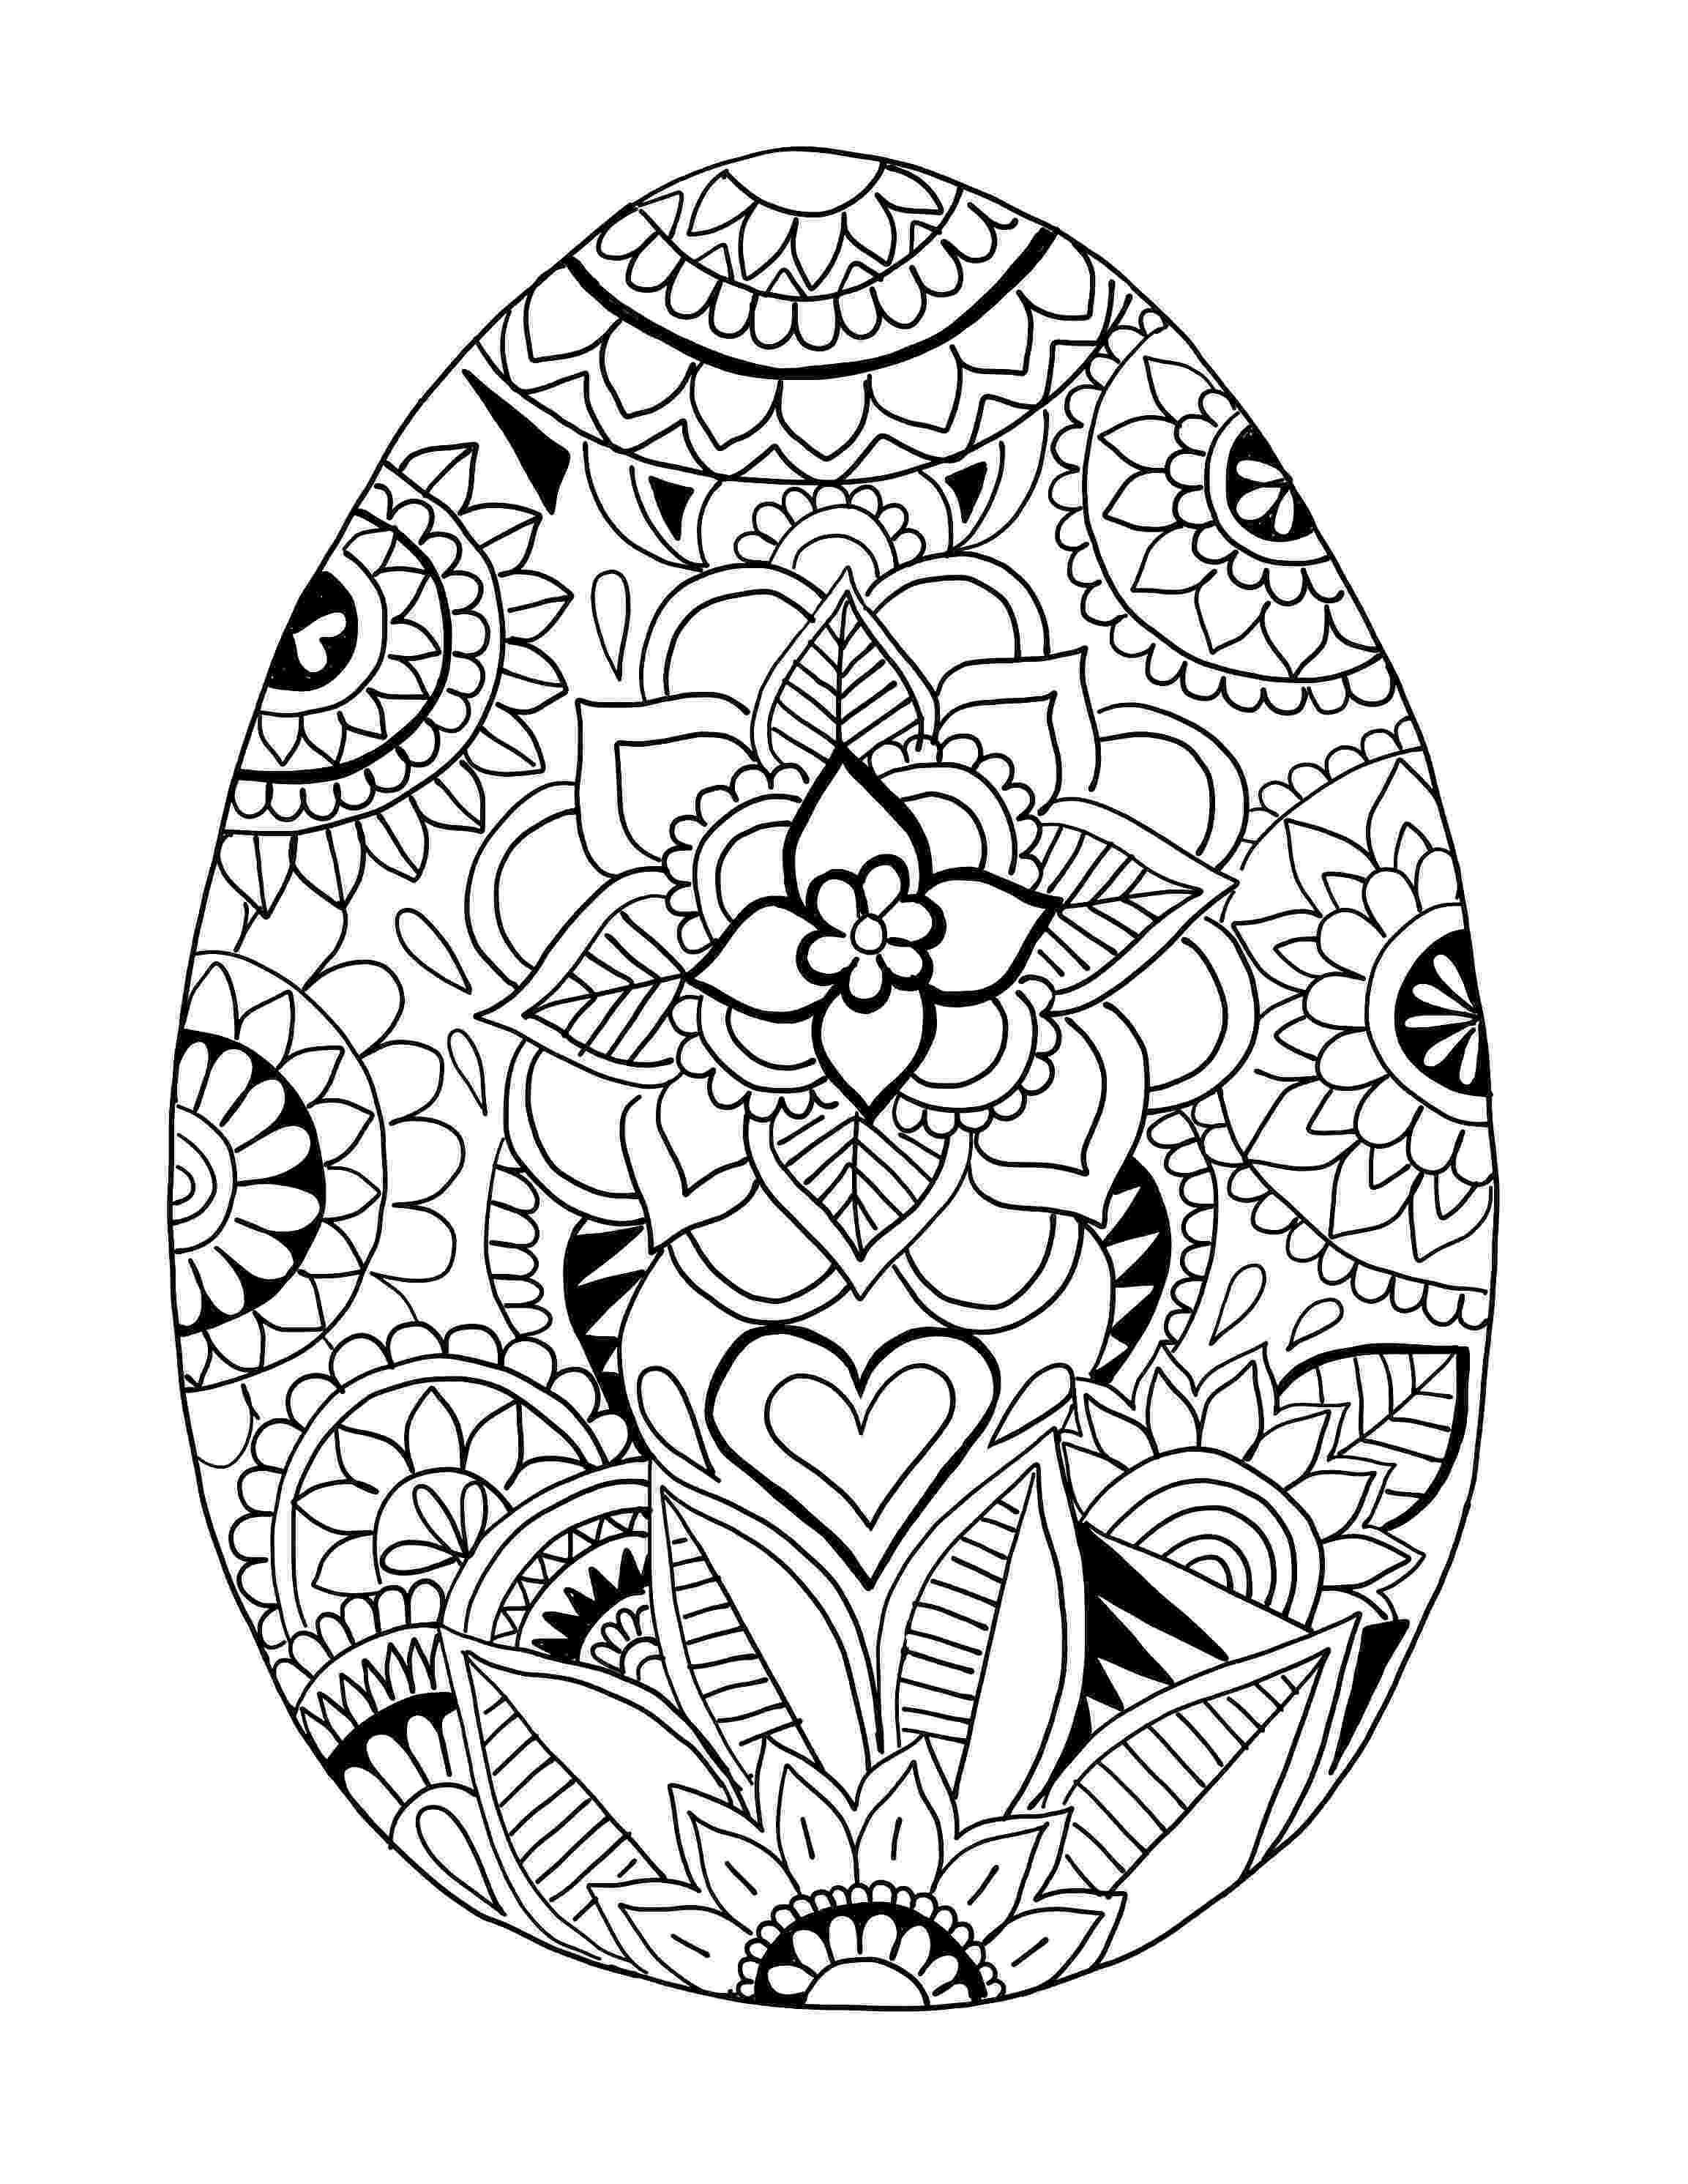 egg coloring sheet free printable easter egg coloring pages for kids sheet coloring egg